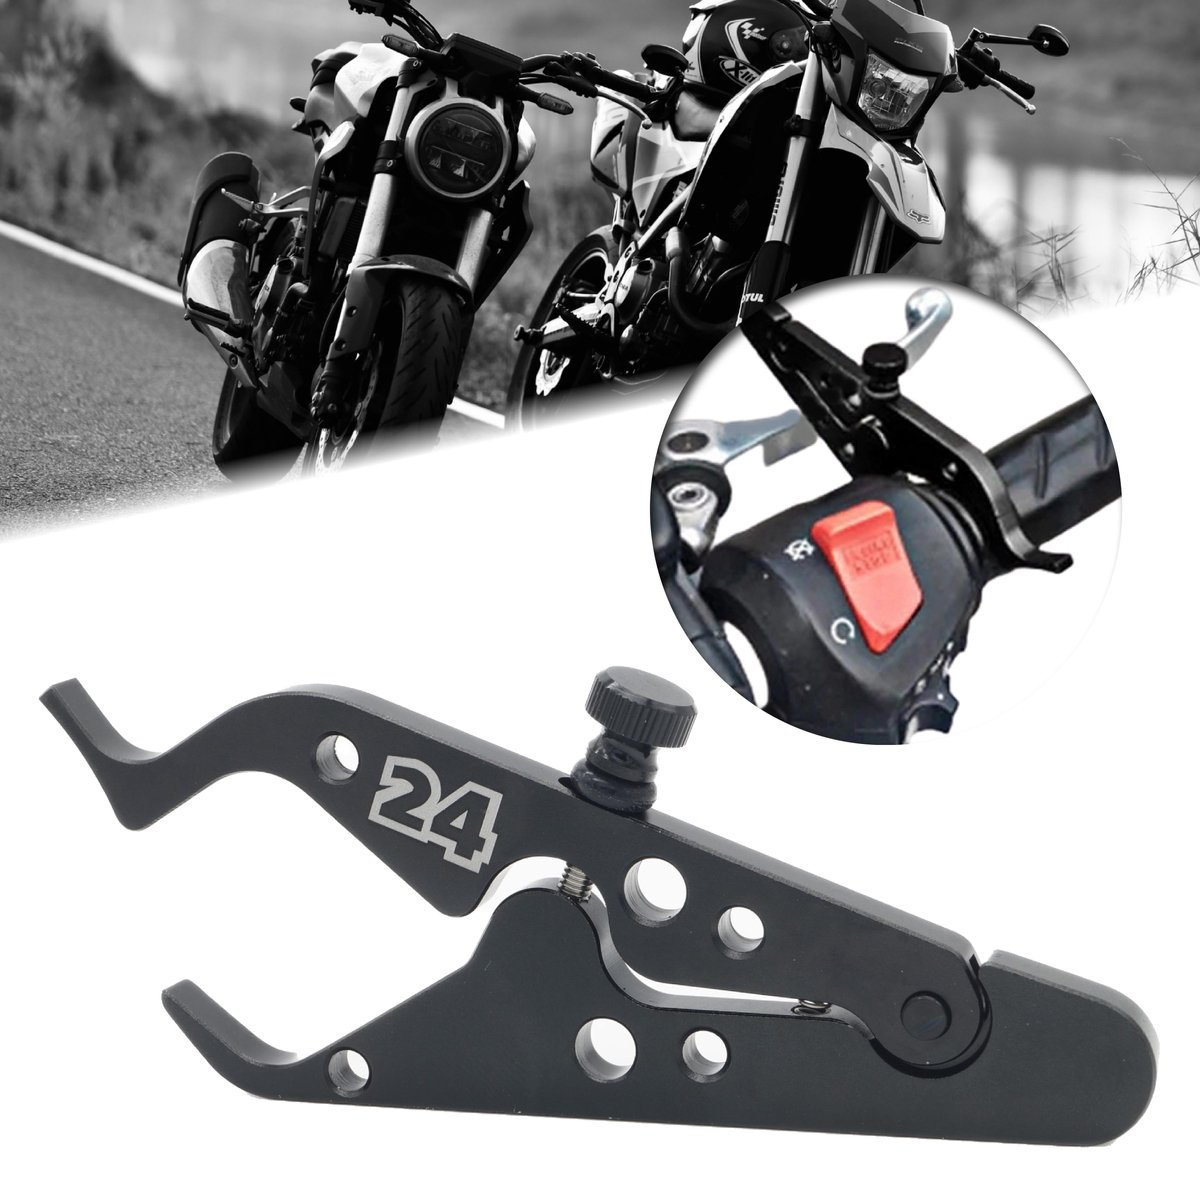 Motor24  - Motorfiets cruisecontrol zwart - motor brommer scooter cruise control - sterk aluminium -